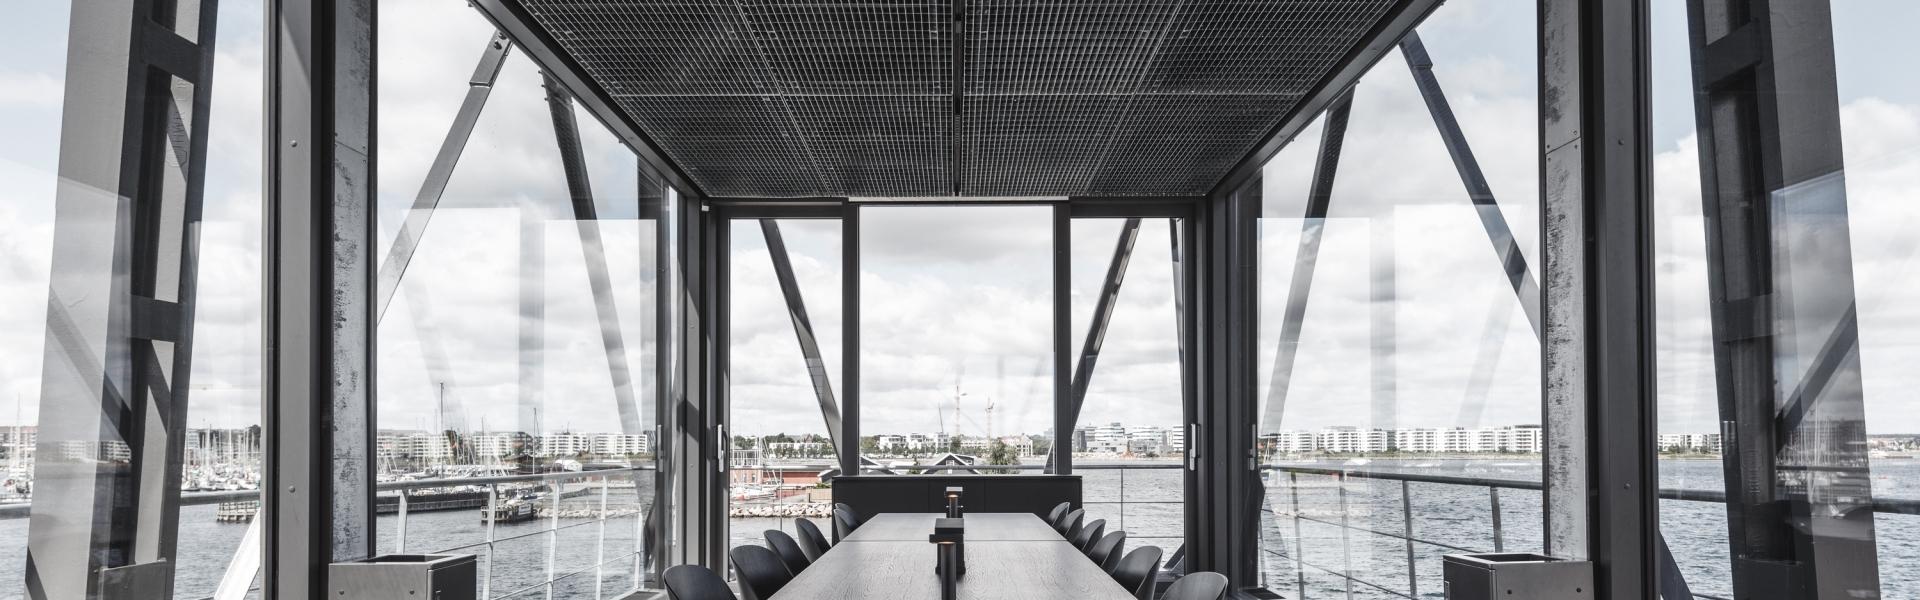 glassbox_meeting